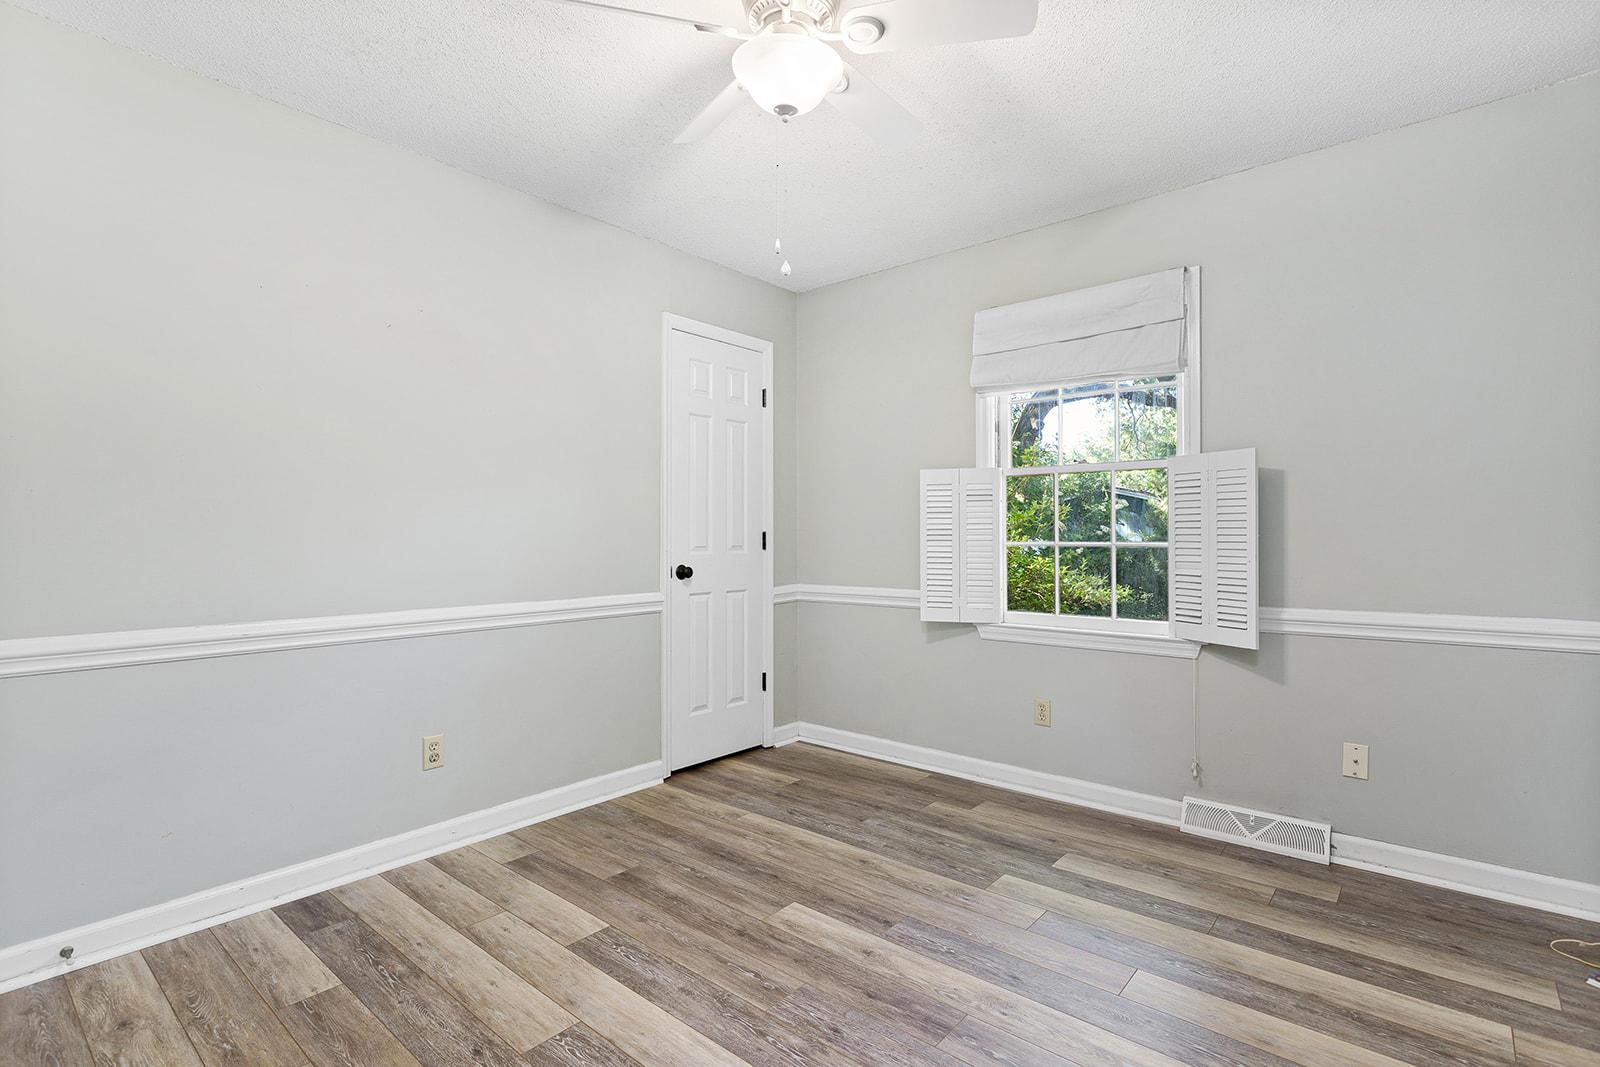 Shemwood II Homes For Sale - 954 Sea Gull, Mount Pleasant, SC - 15